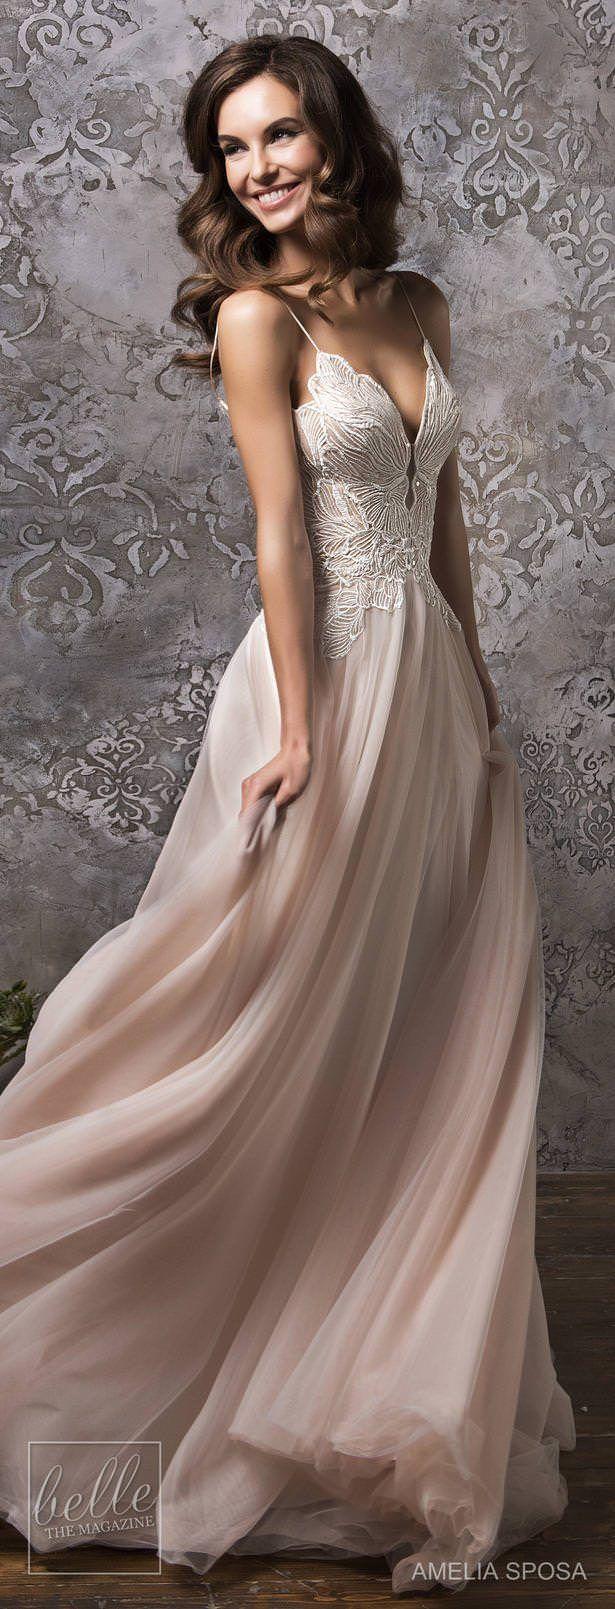 Amelia sposa wedding dress collection fall wedding dresses